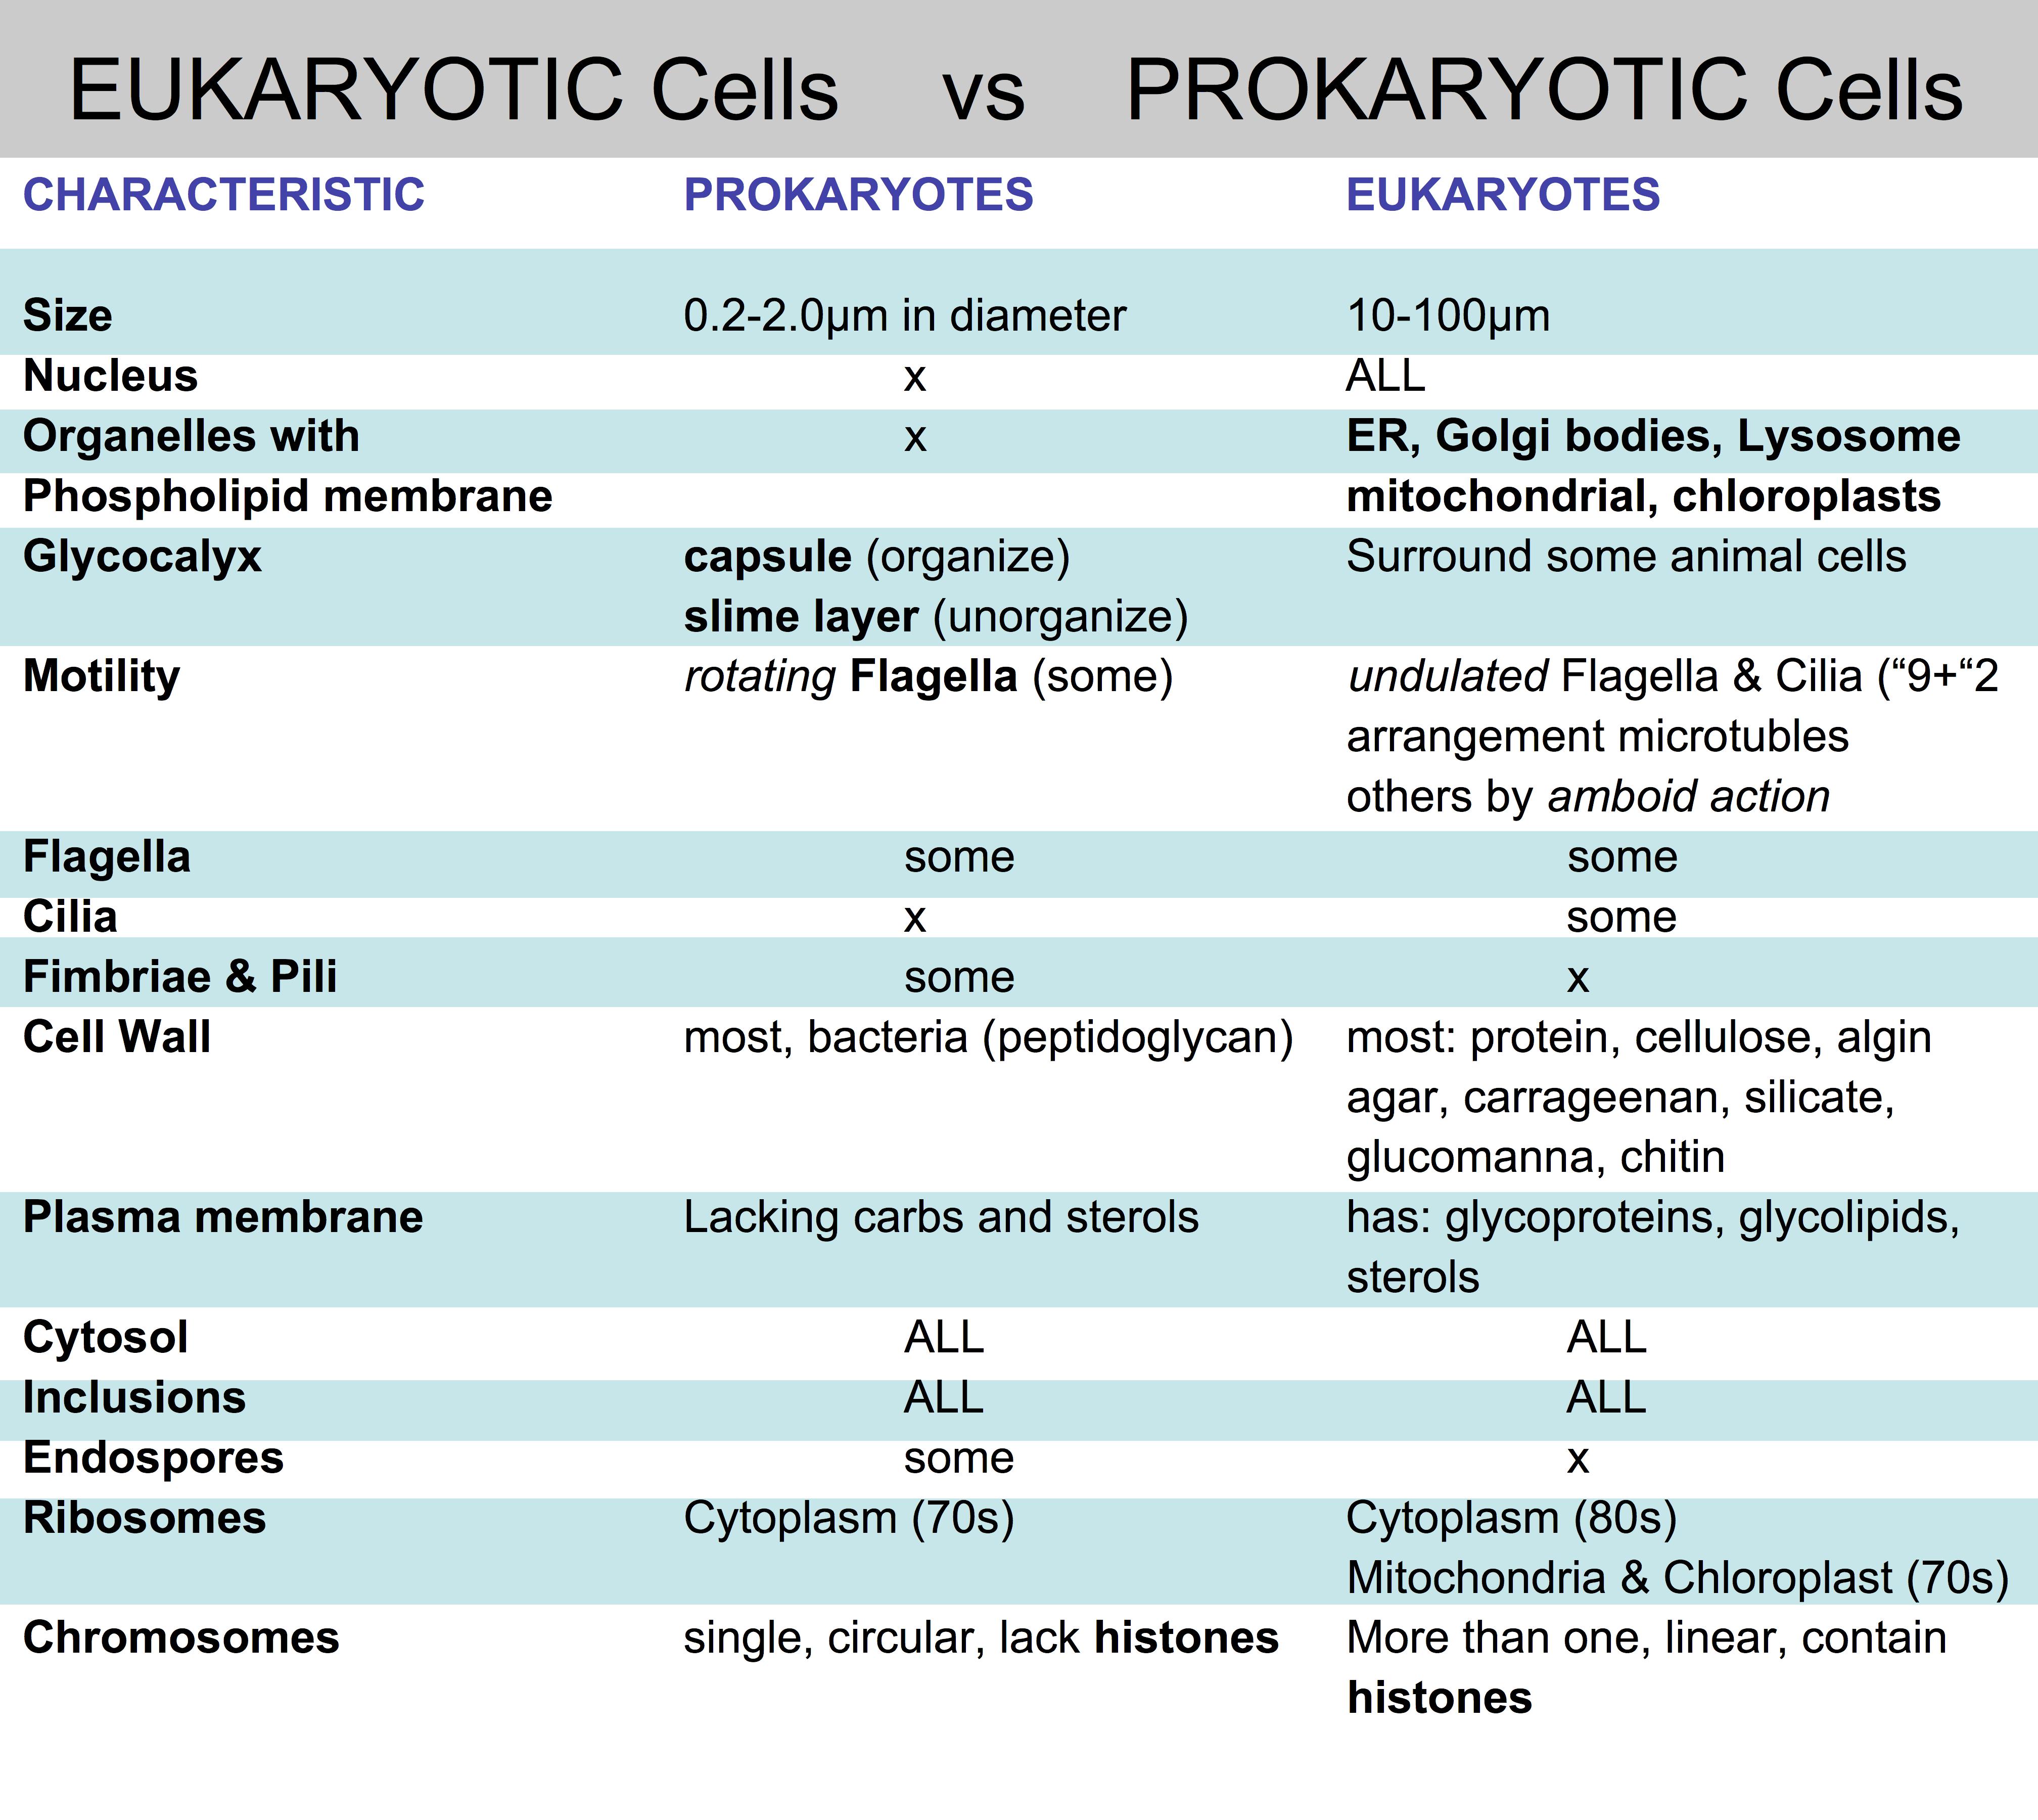 Worksheets Prokaryotes Vs Eukaryotes Worksheet prokaryotic and eukaryotic cells worksheet free worksheets library cell types prok ryotes v euk pl nt nim l michelleburden